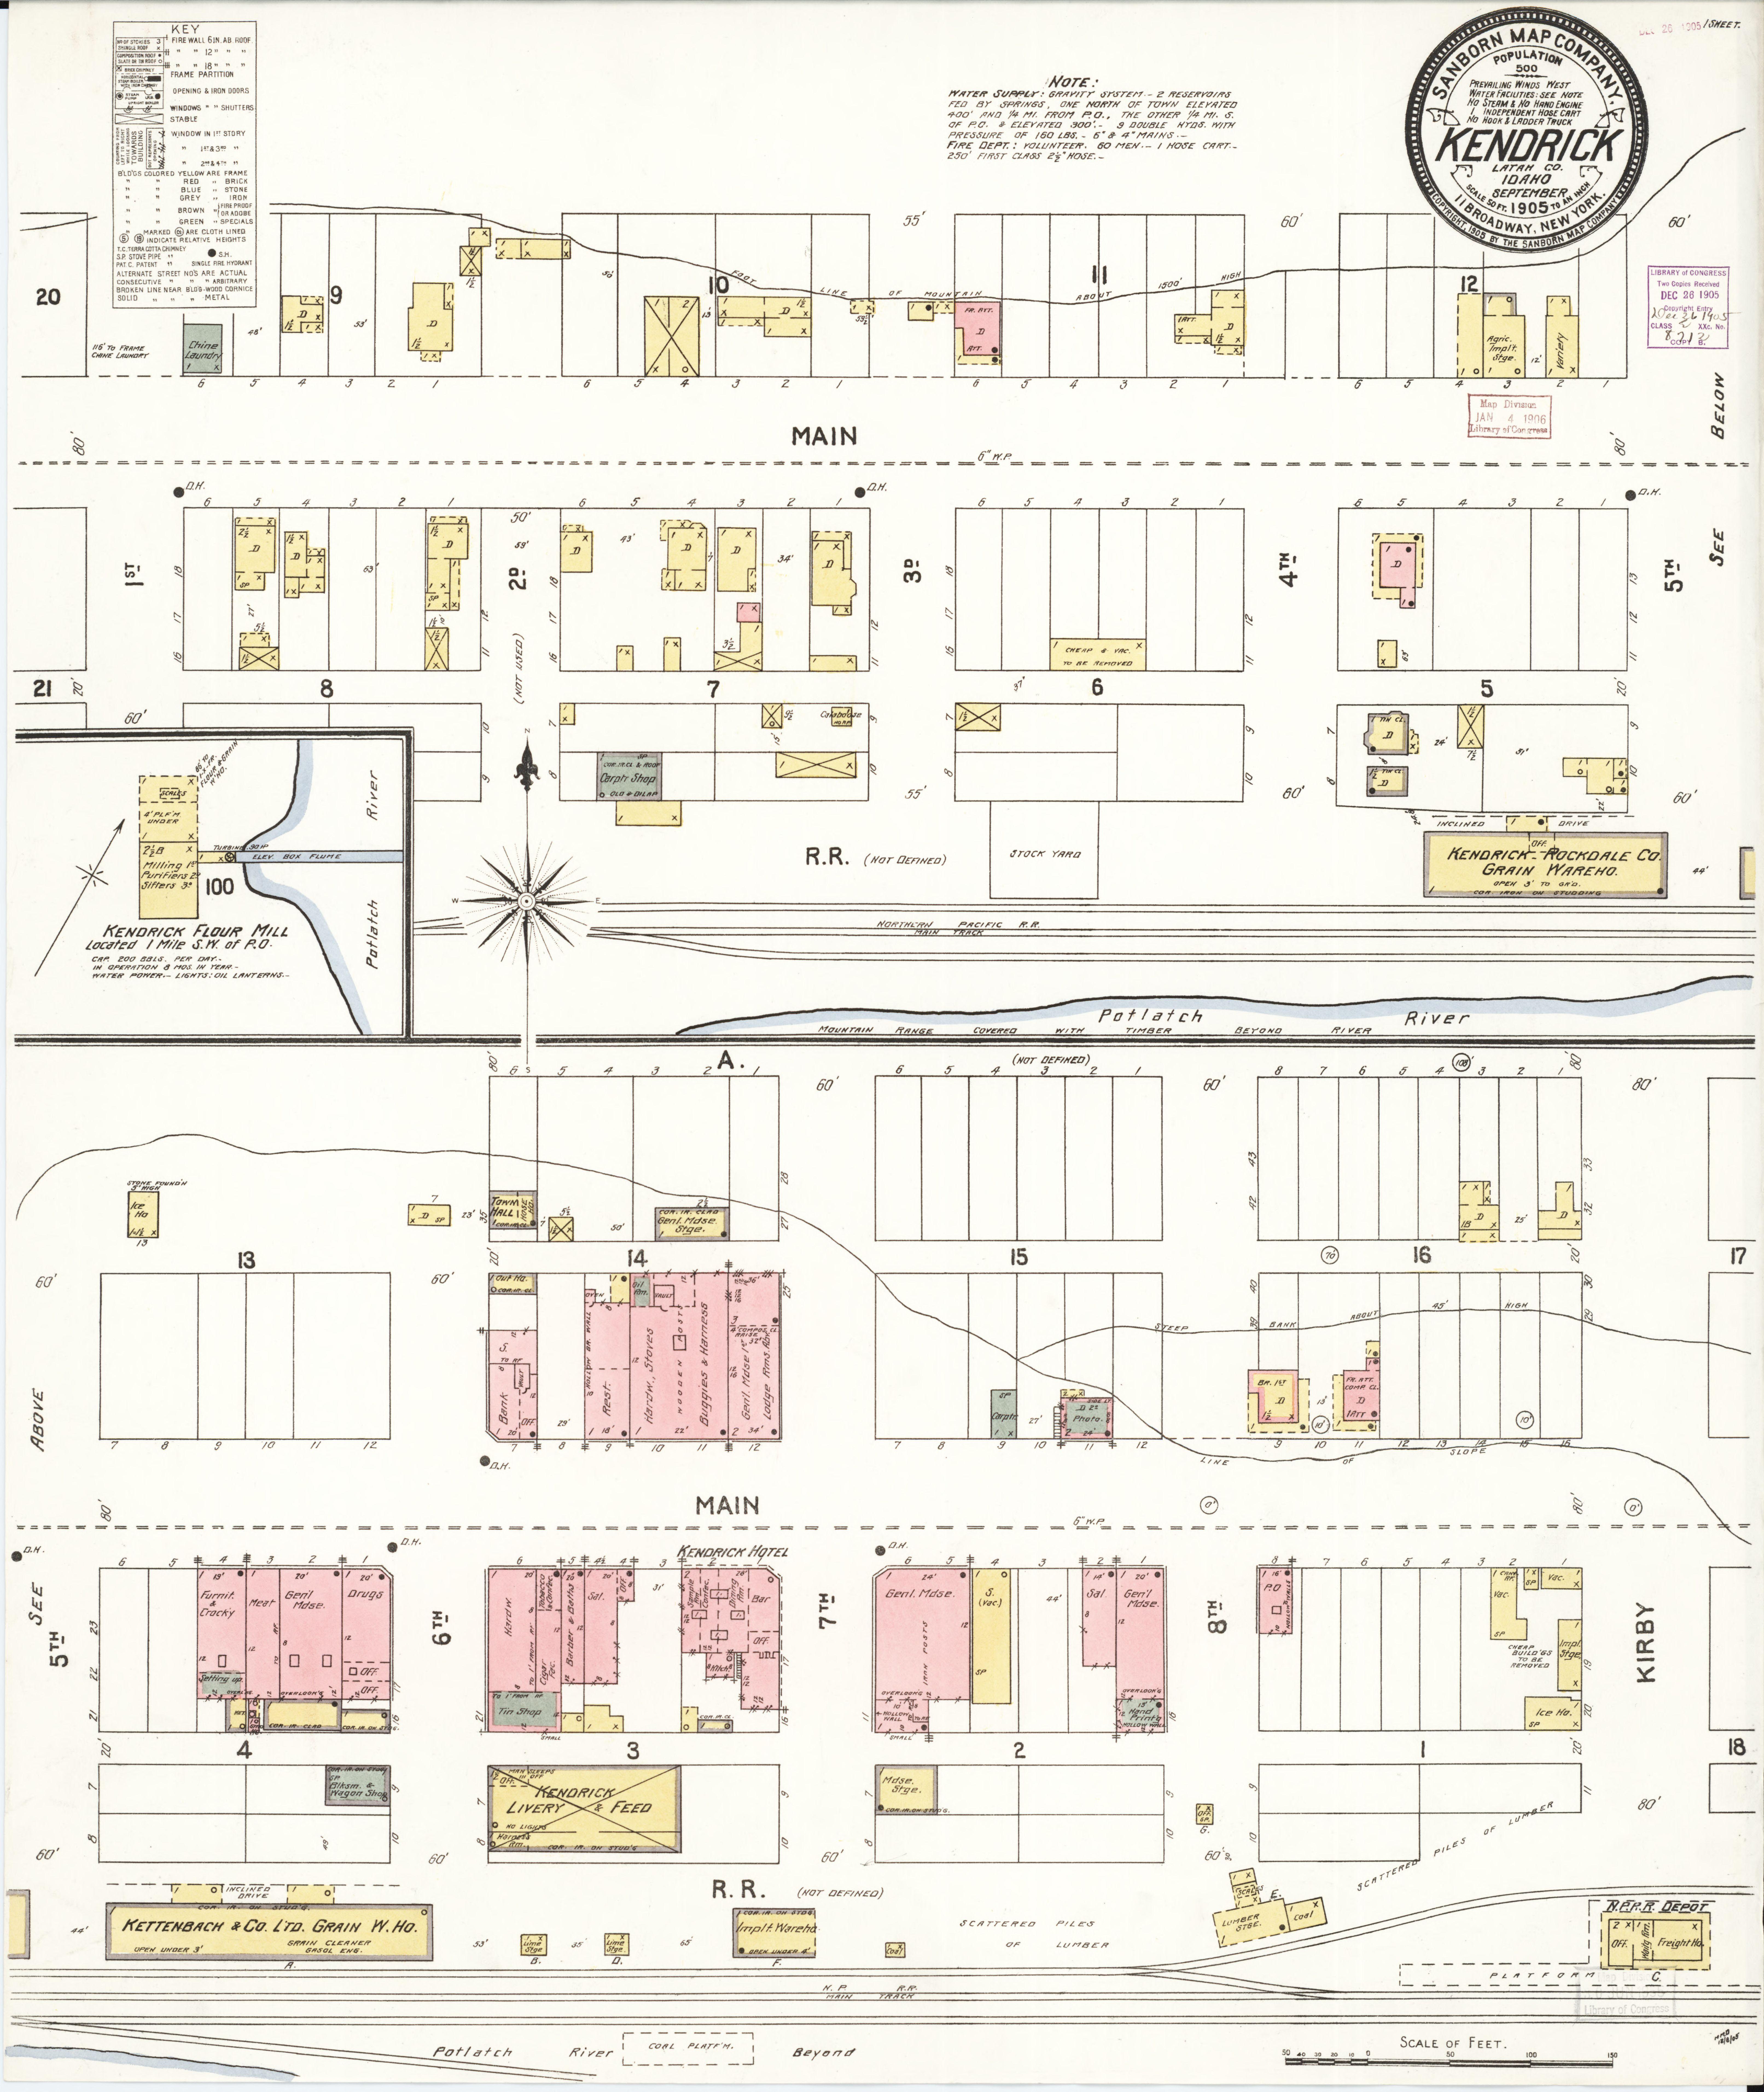 Kendrick Idaho Map.File Sanborn Fire Insurance Map From Kendrick Latah County Idaho